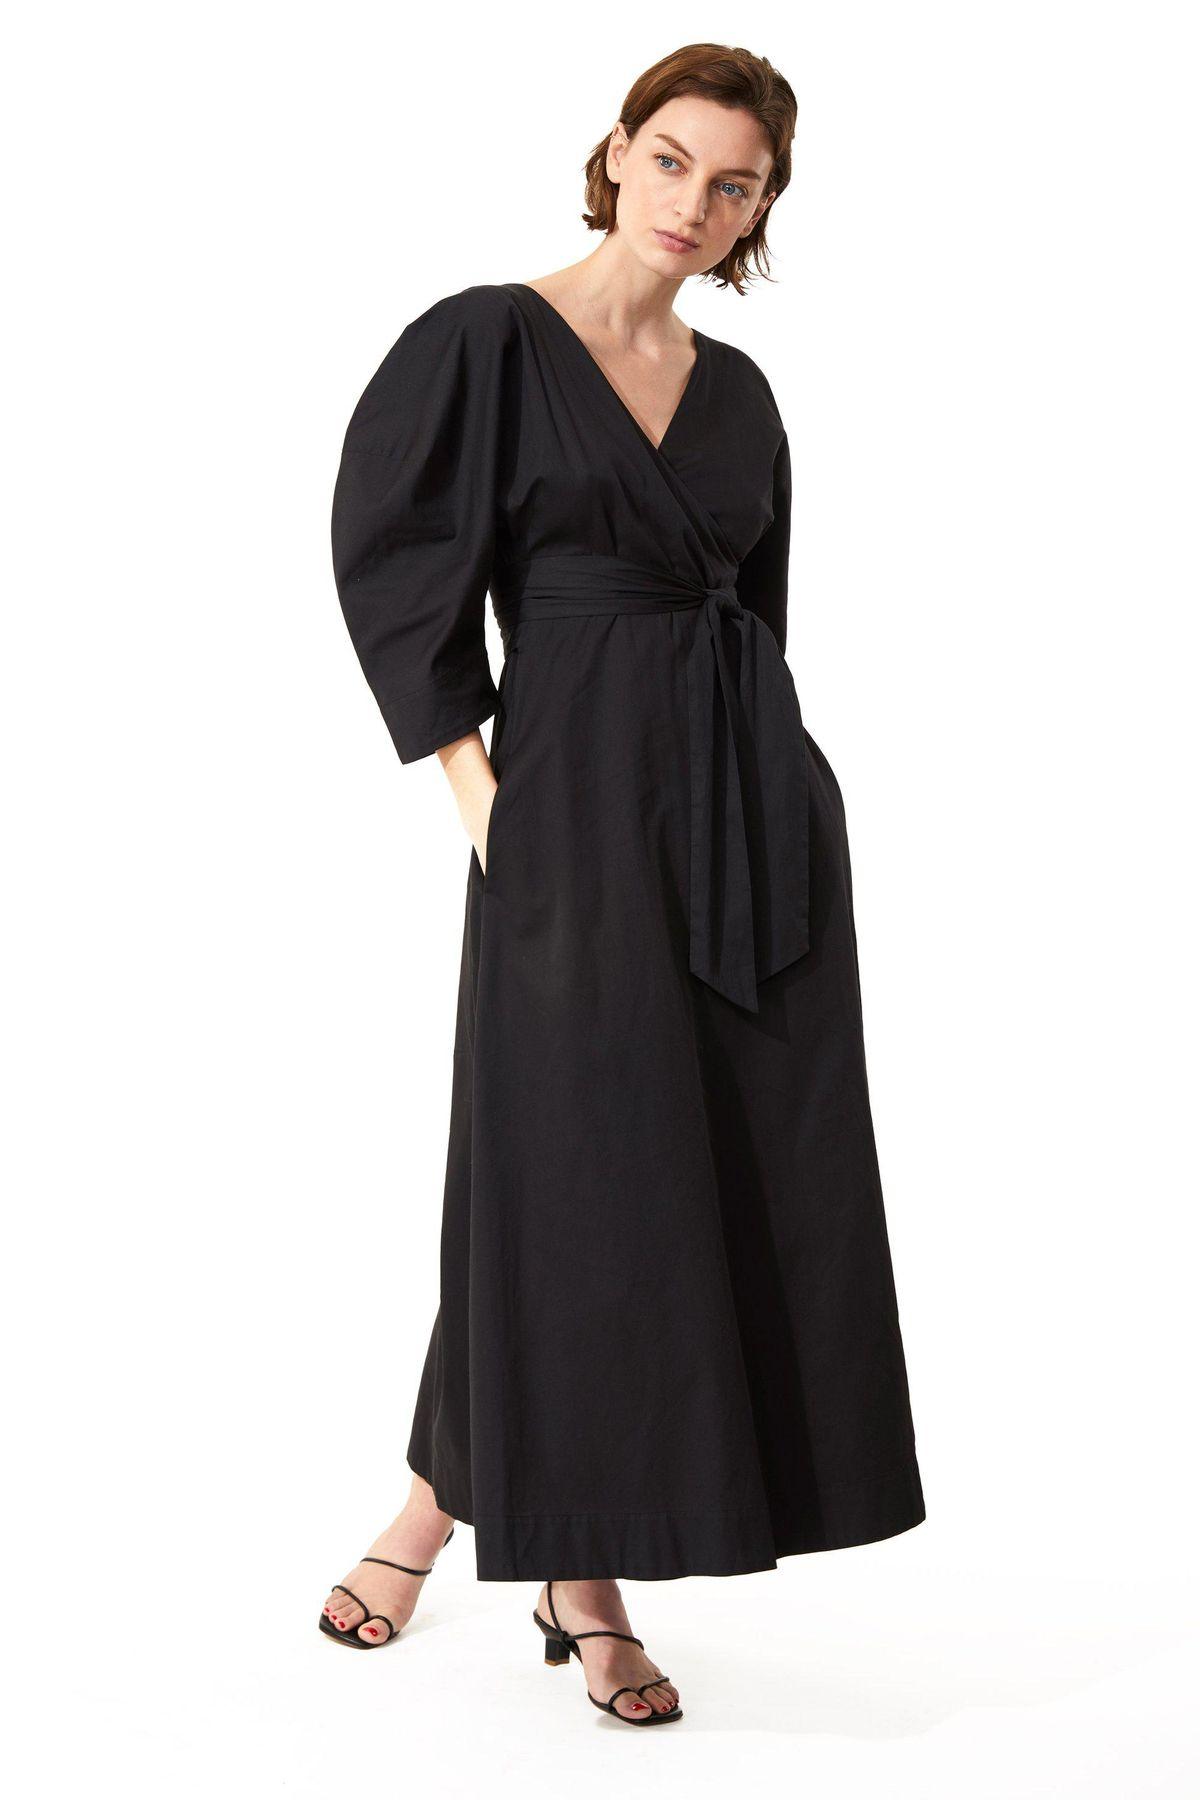 mara hoffman agnelia dress